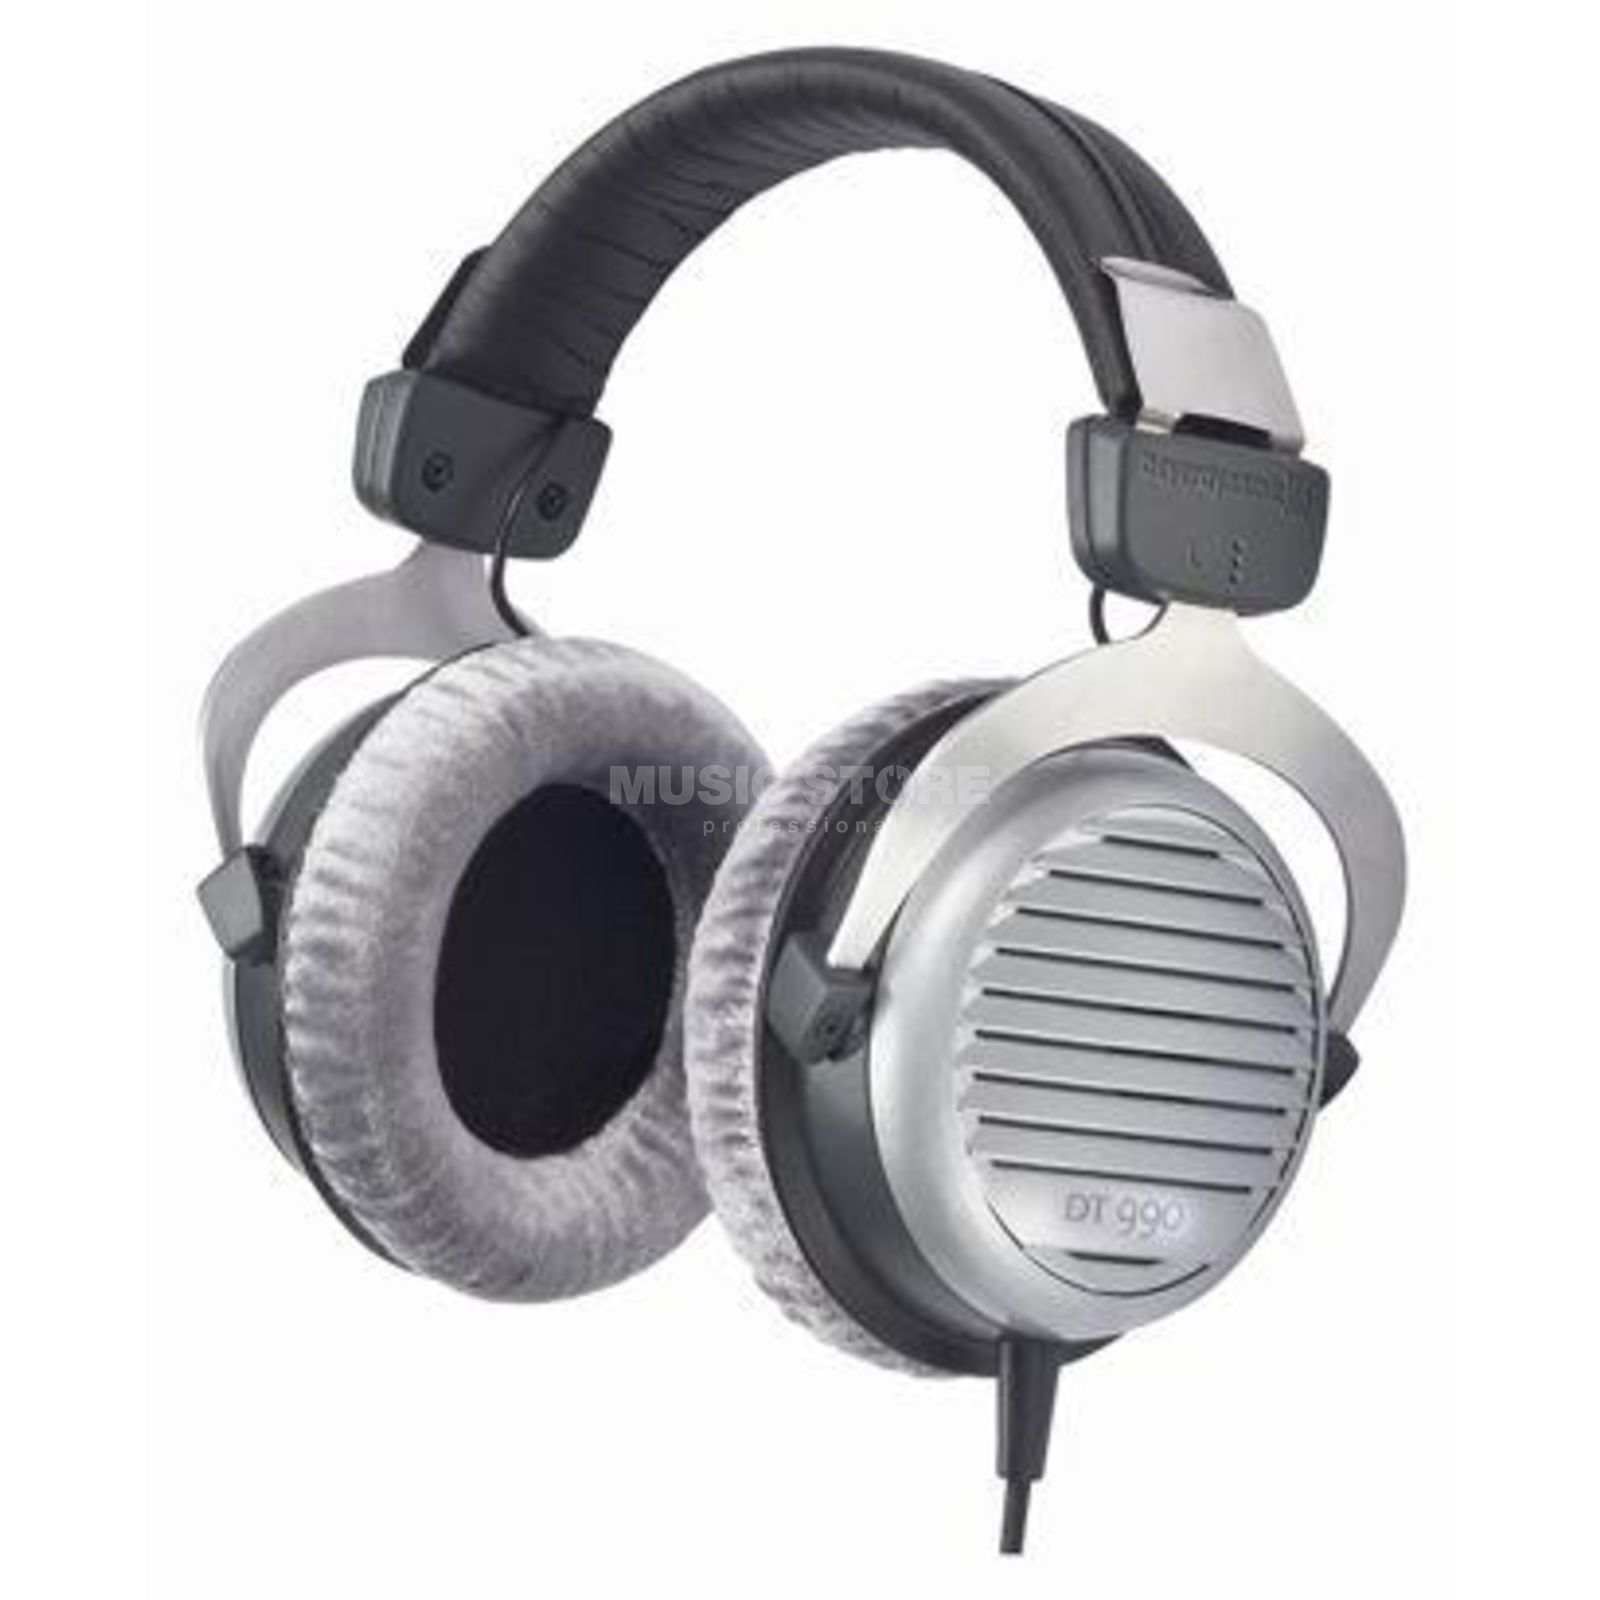 beyerdynamic dt 990 edition 250 ohm premium headphones open. Black Bedroom Furniture Sets. Home Design Ideas